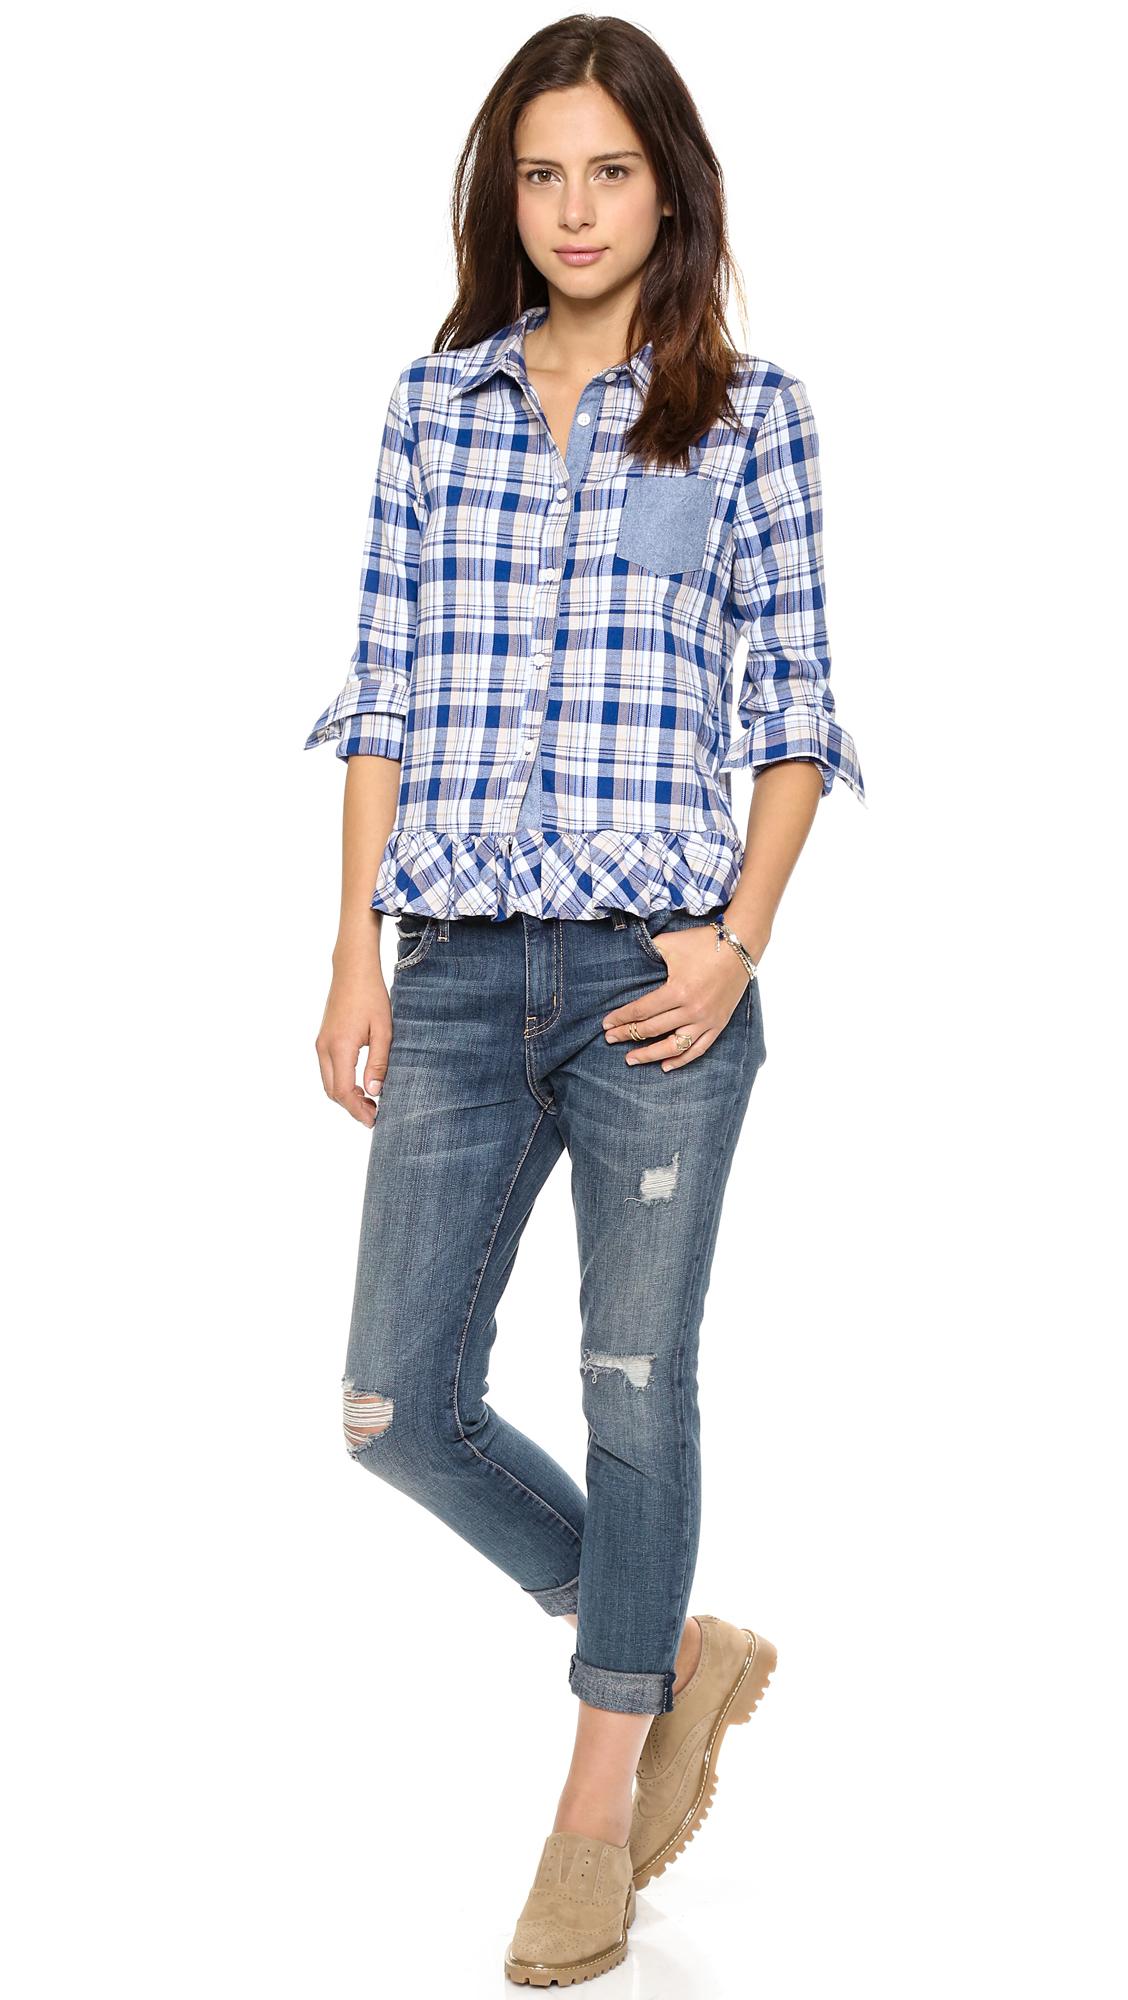 Clu Too Ruffled Plaid Shirt Navy Plaid In Blue Lyst